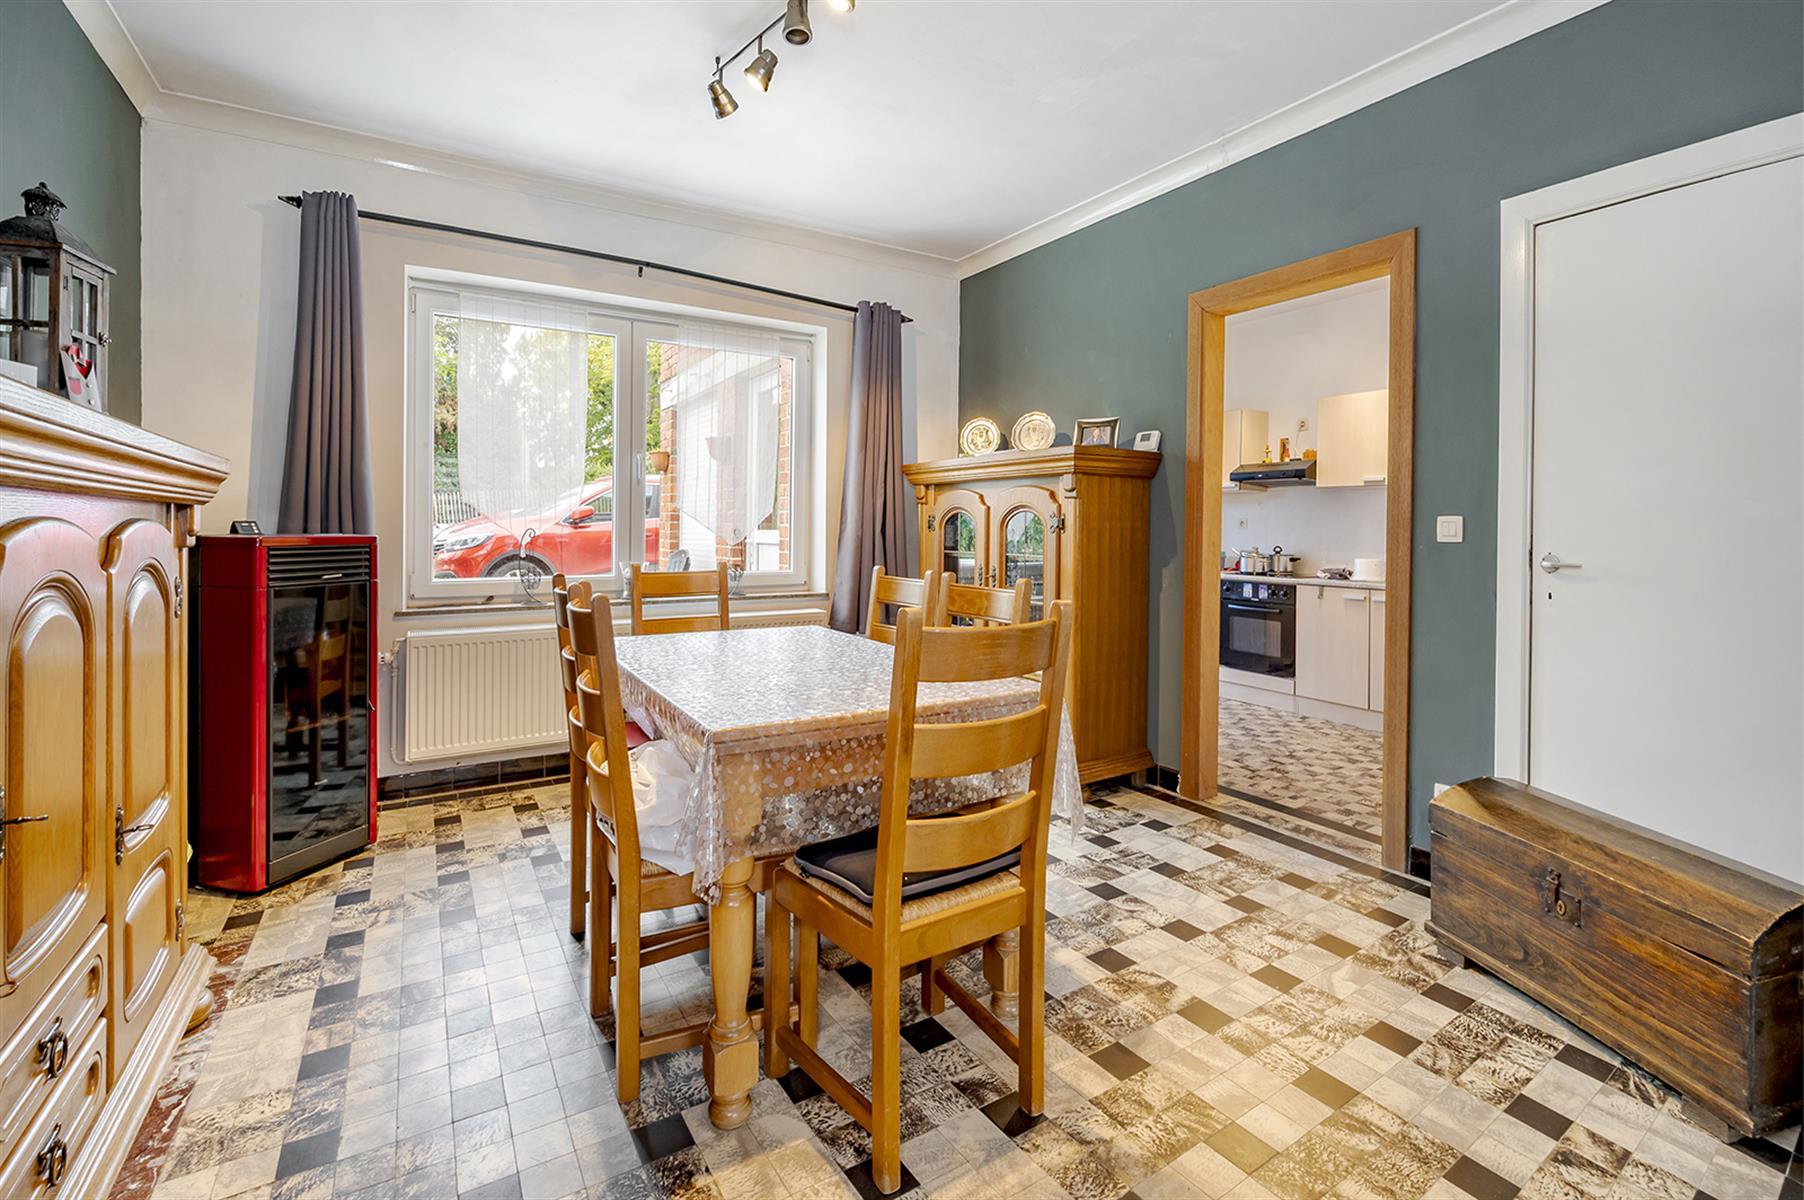 Maison - Burdinne - #3885909-4